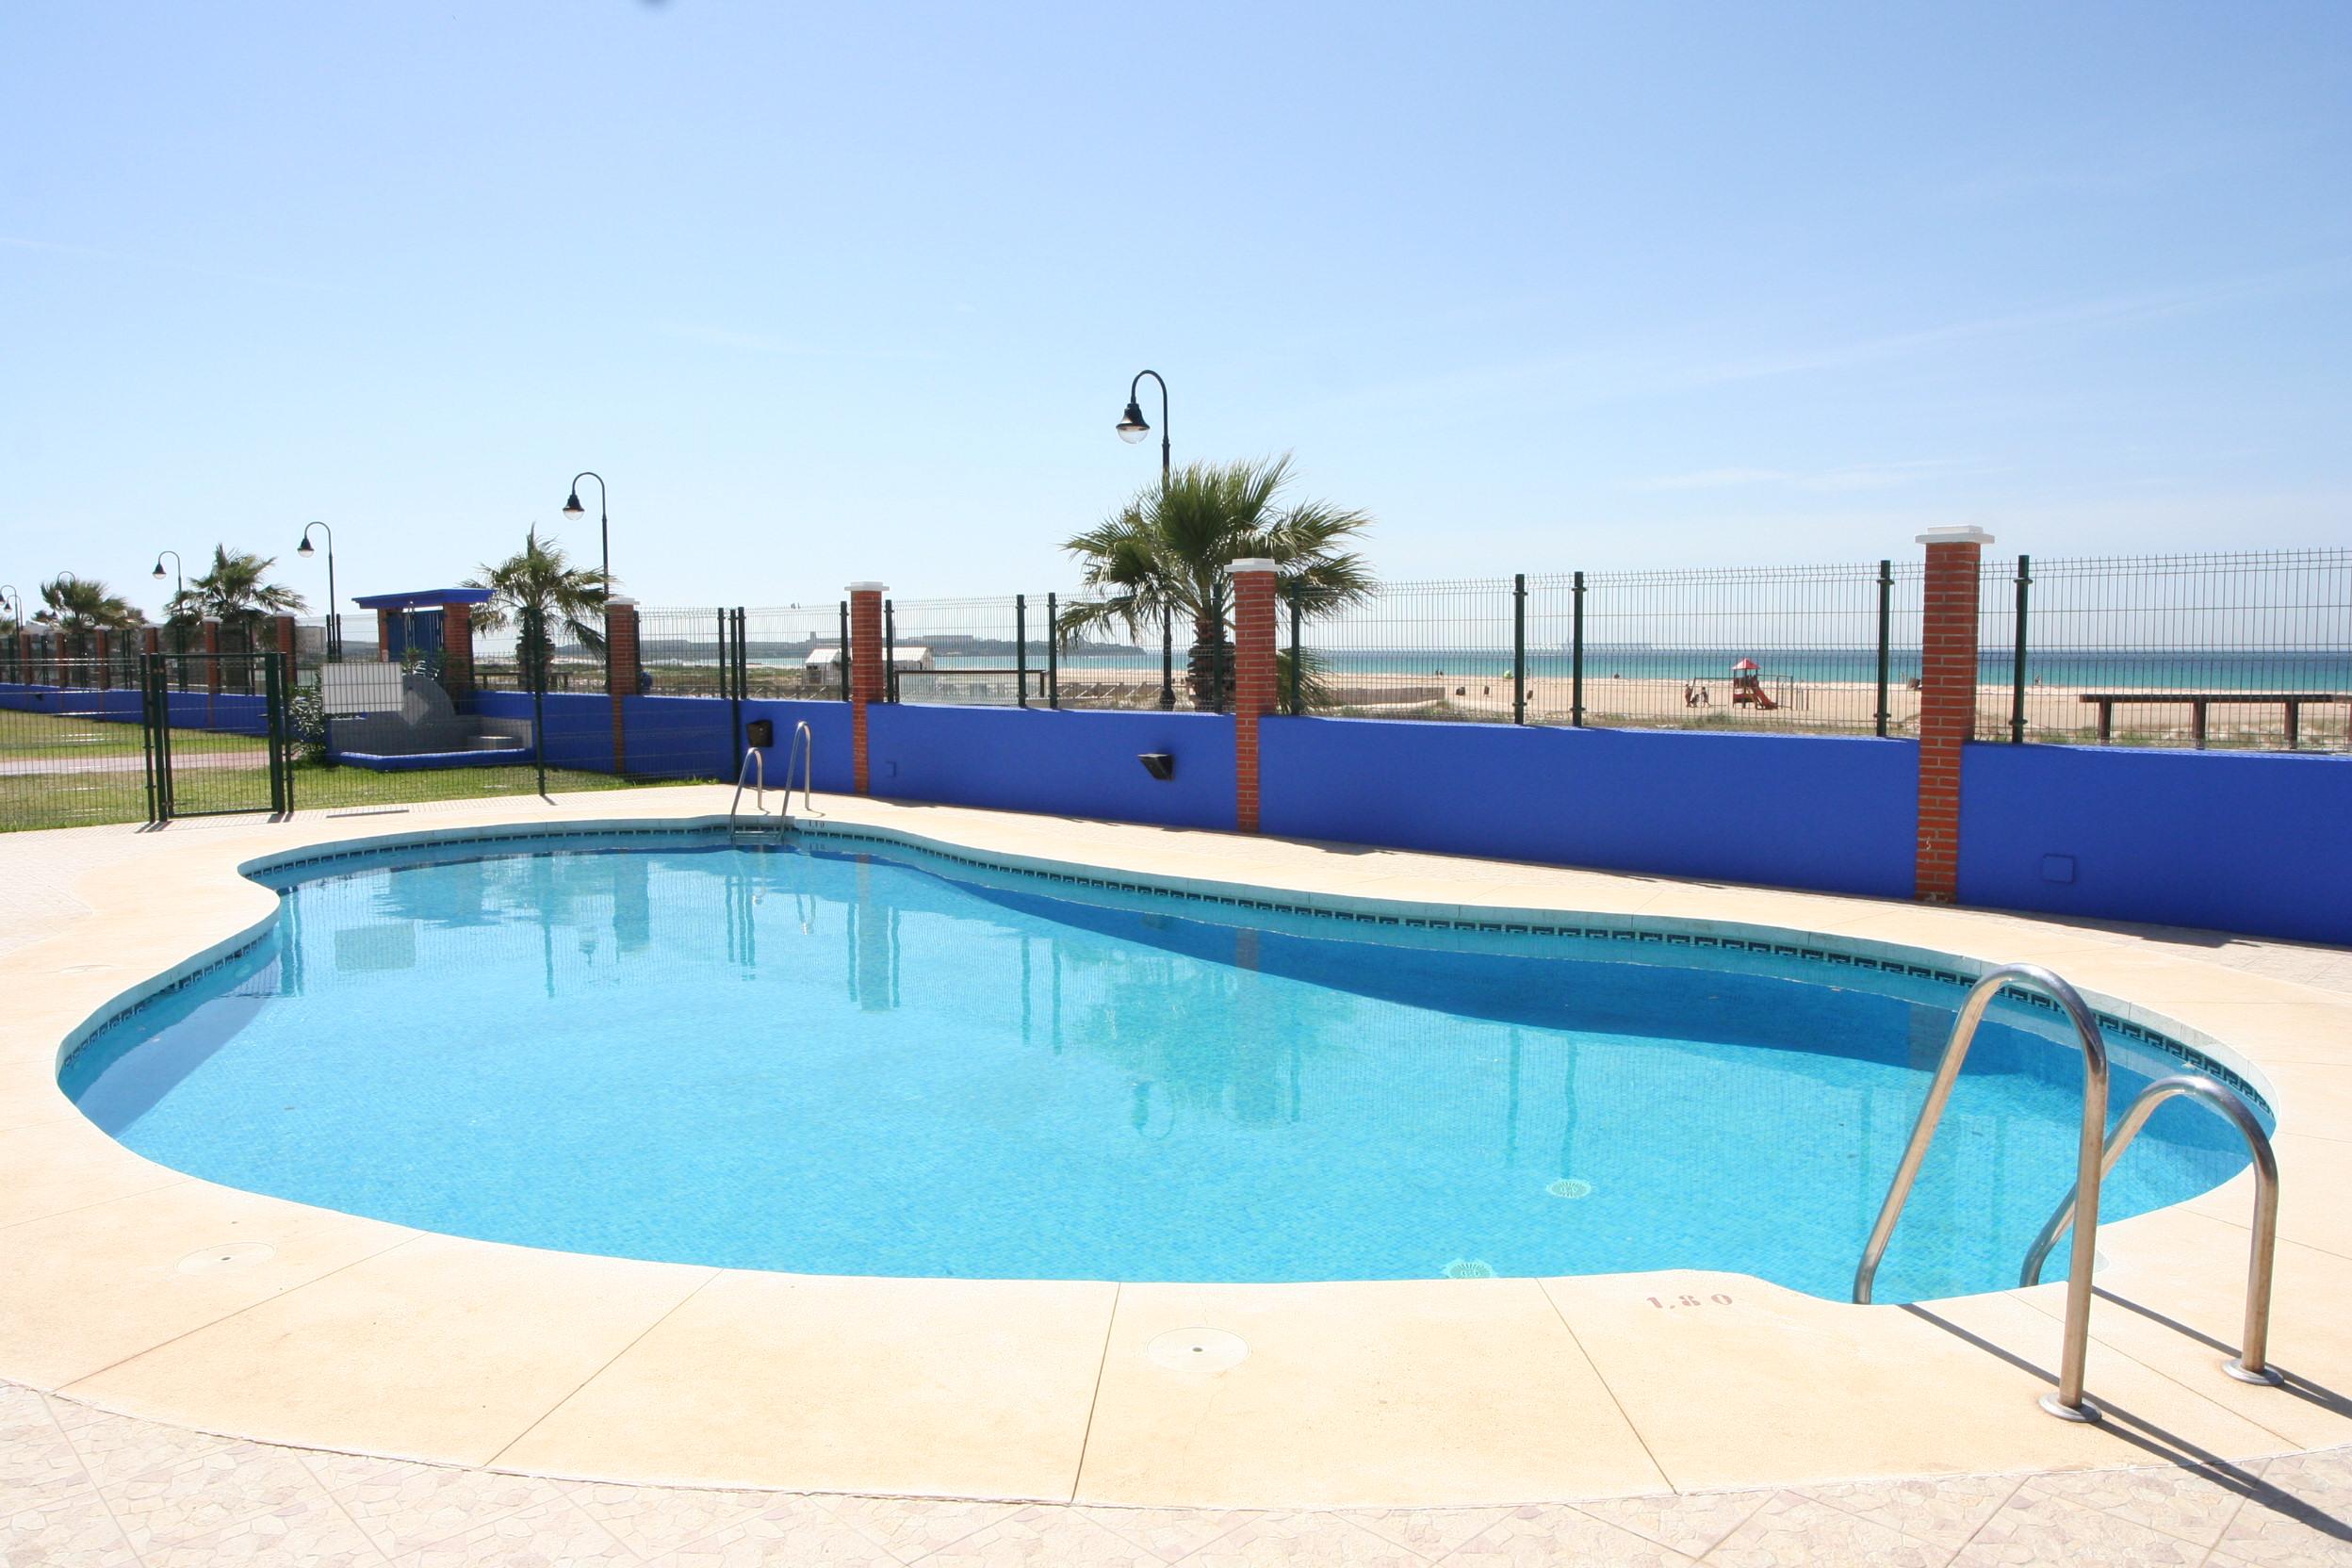 Holiday apartment in tarifa tarifa adventure - Swimming pool in spanish language ...